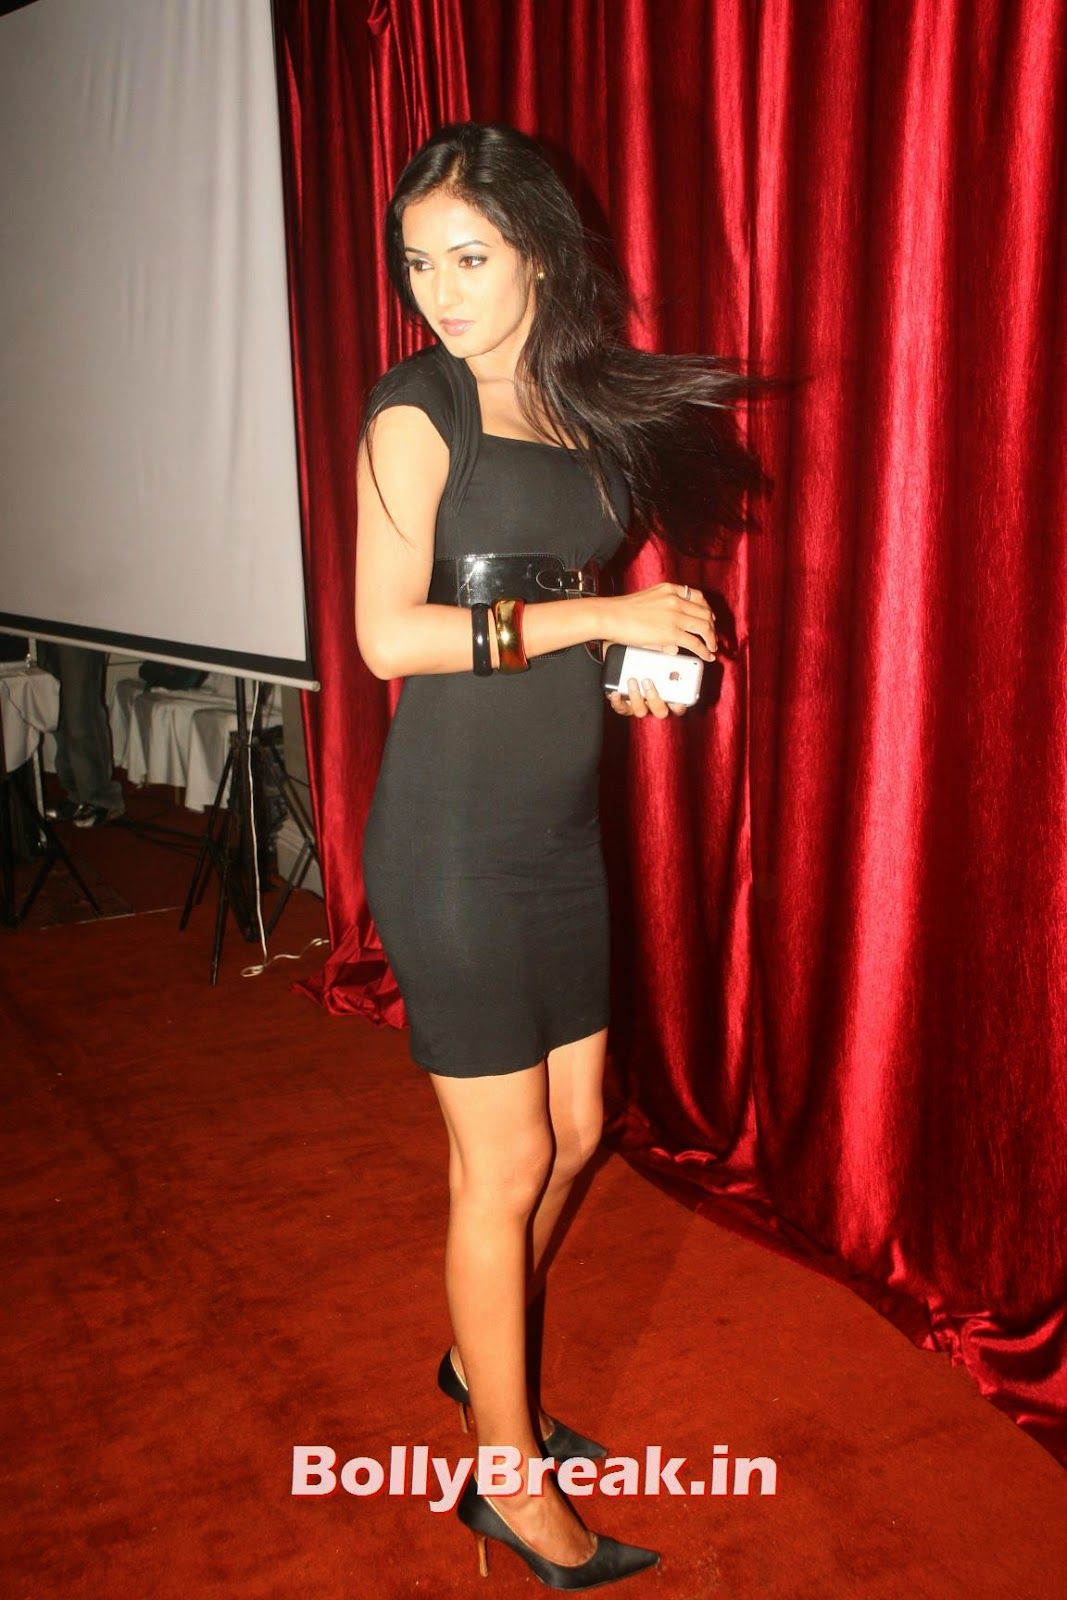 [IMG] [/IMG],  Sonal Chauhan Hot HD Pics in Black Dress